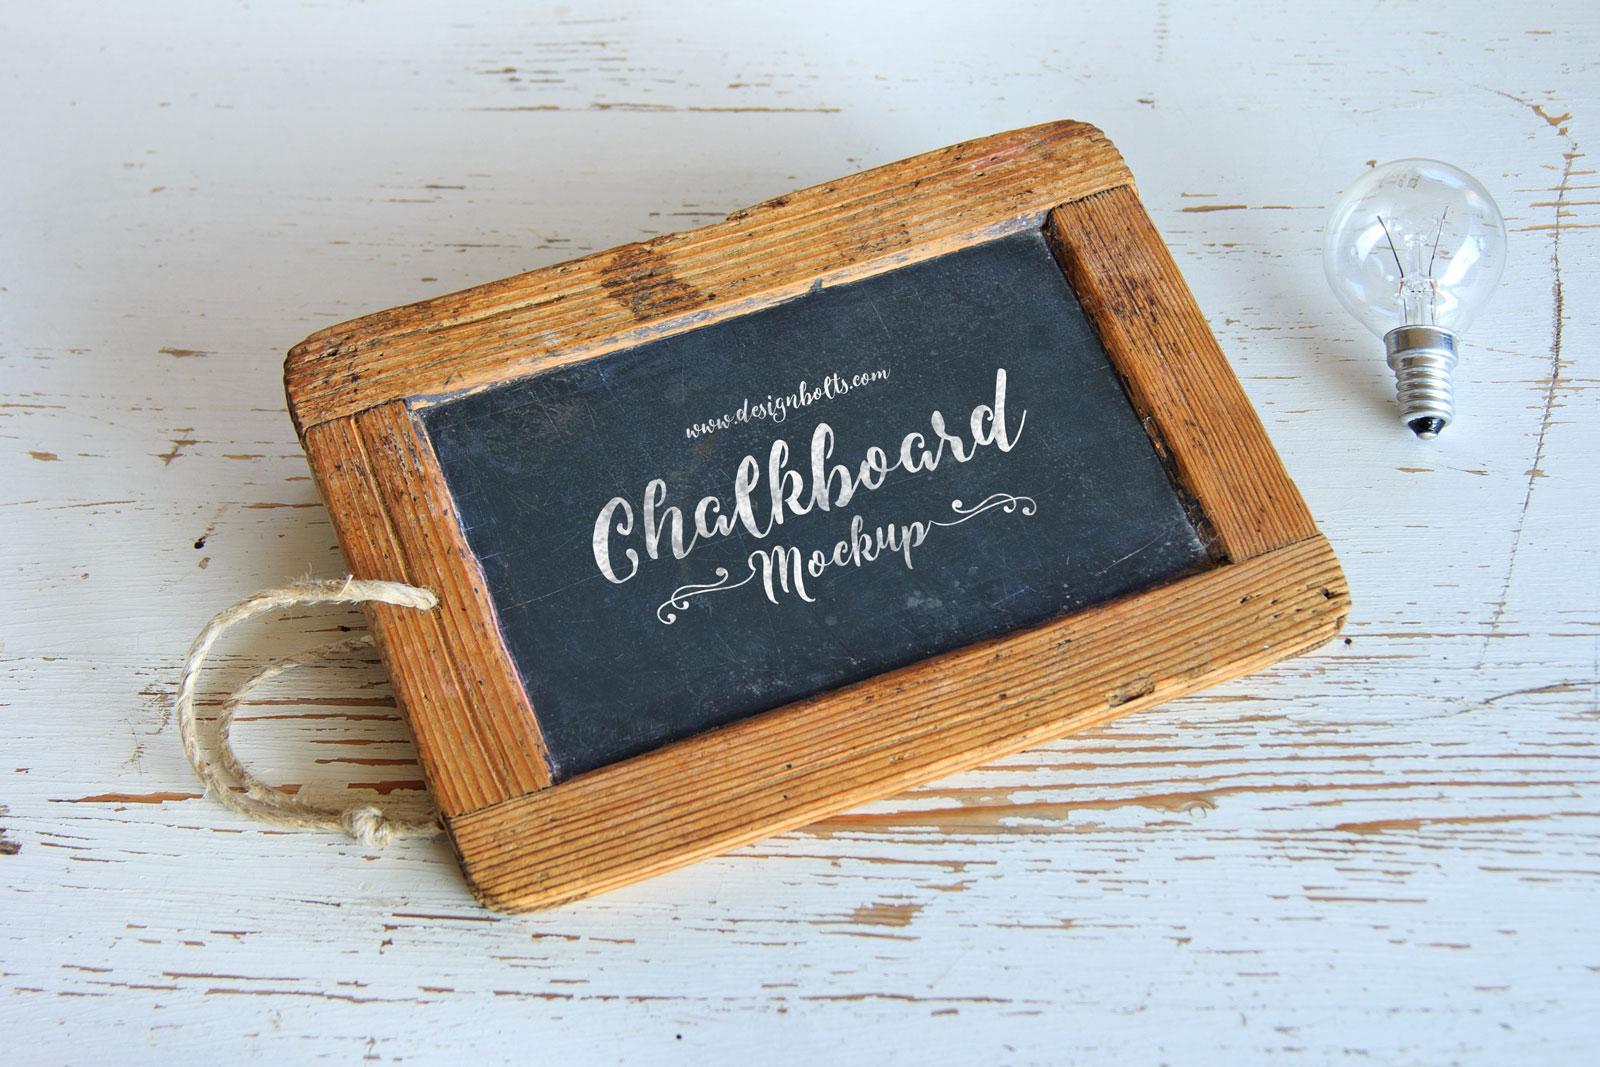 Free-Chalkboard-Frame-Mockup-PSD-for-Lettering-&-Typography-2